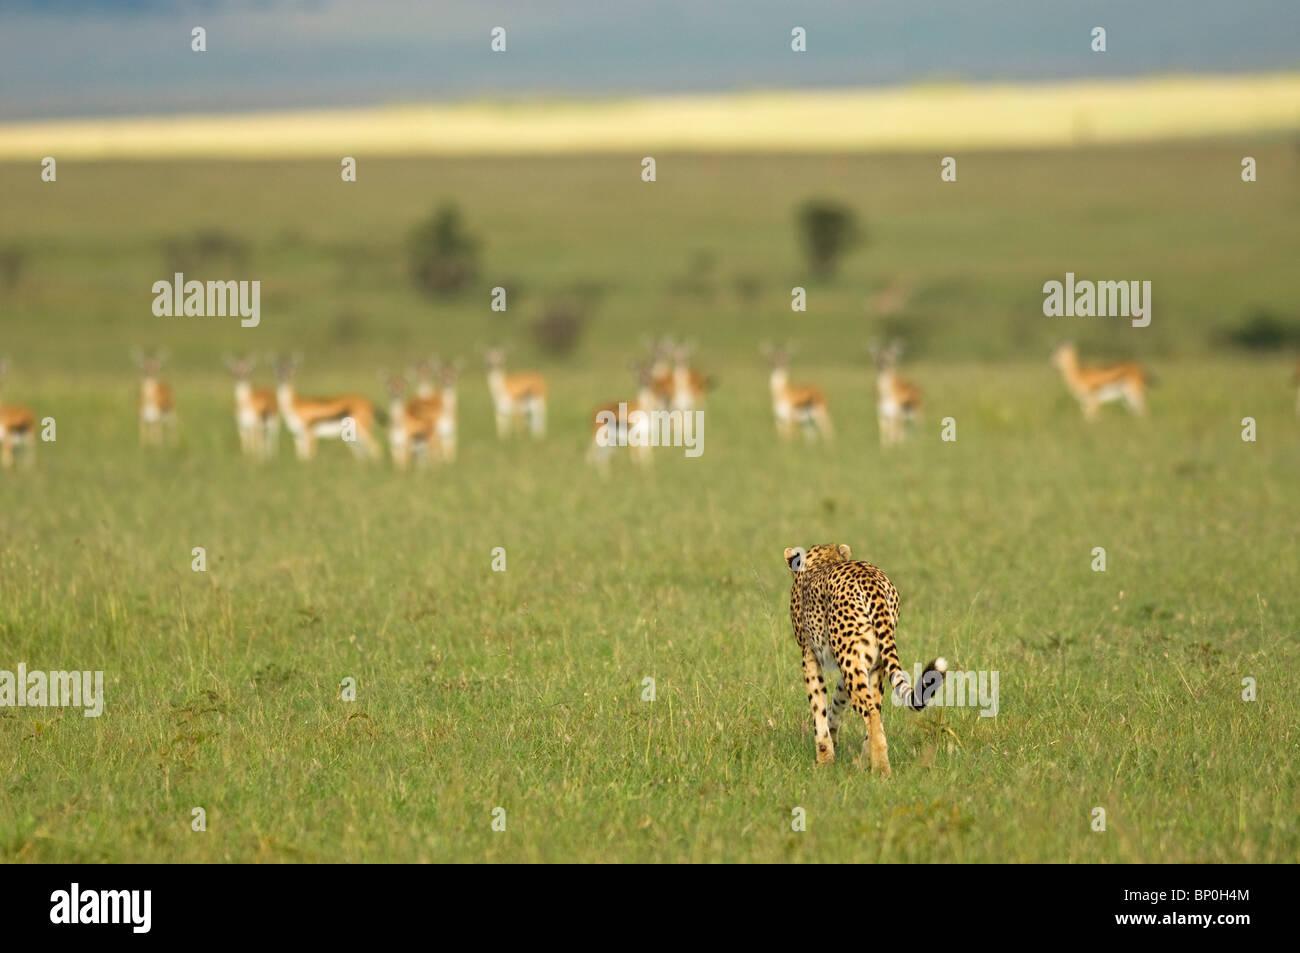 Kenya, Masai Mara. A female cheetah stalks a herd of Thomson's gazelle on the savannah. - Stock Image